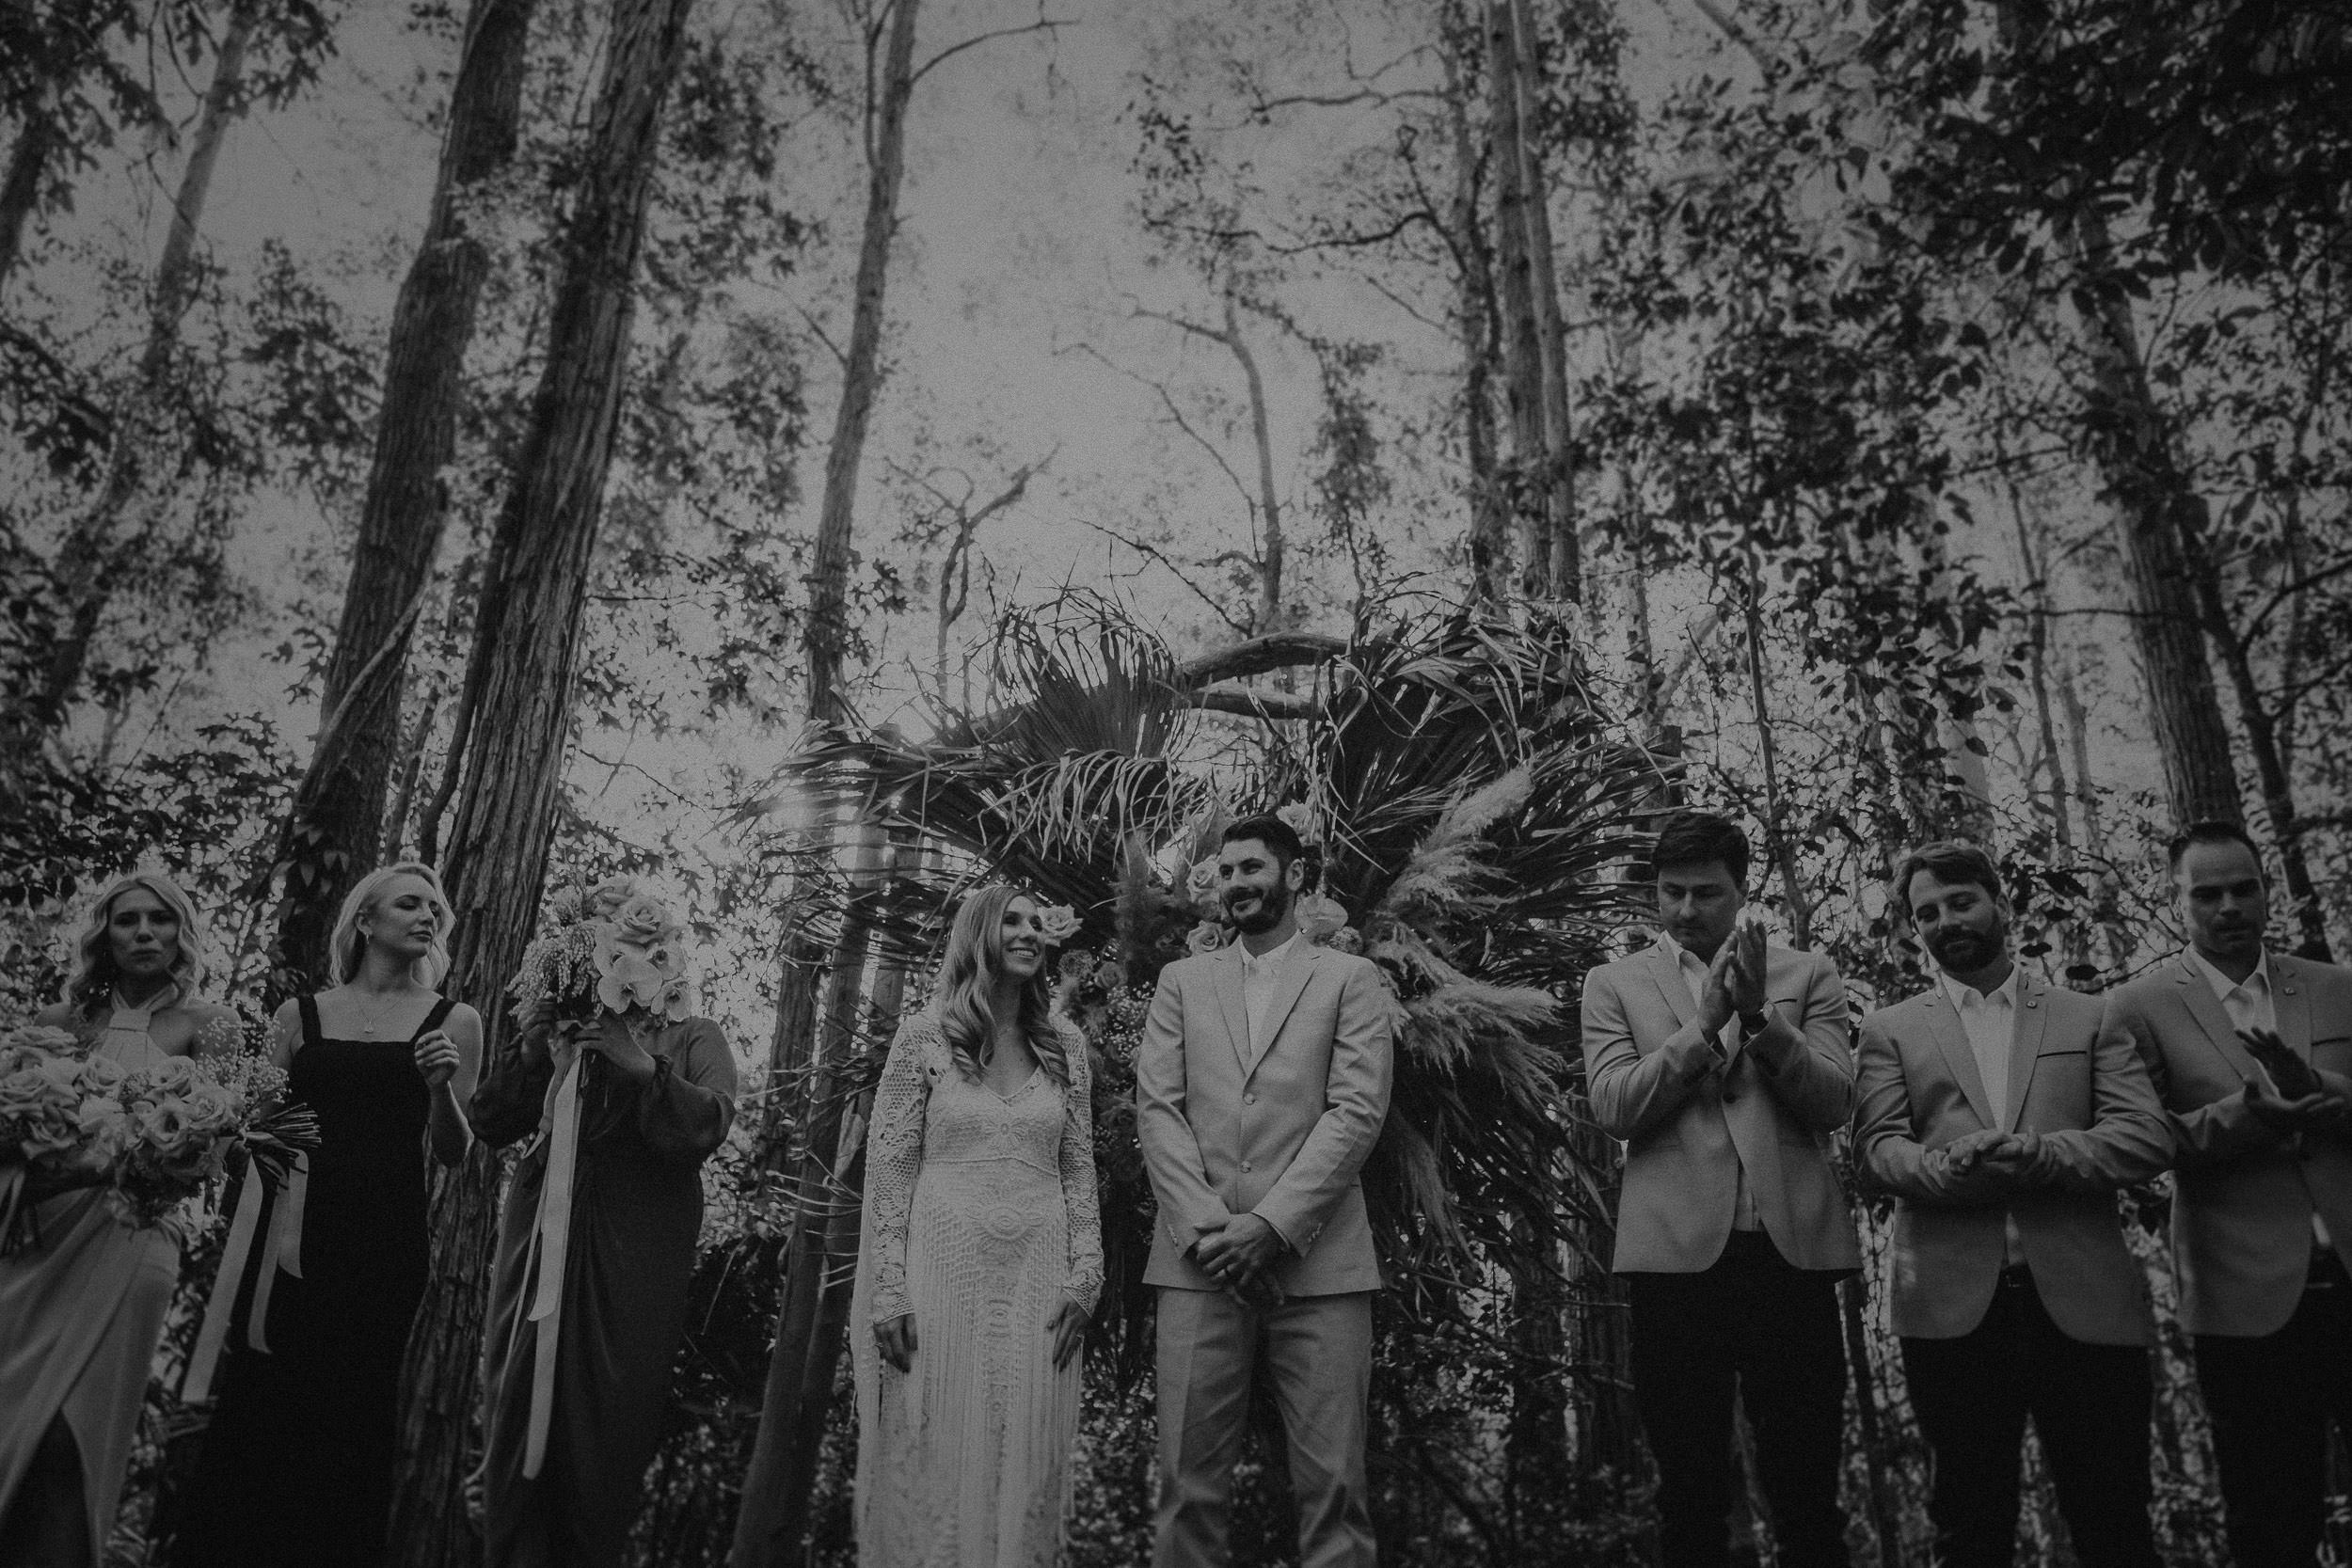 S&A Elopement - Kings & Thieves - Shred 'Til Dead - Central Coast Beach Forest Wedding - 253.jpg